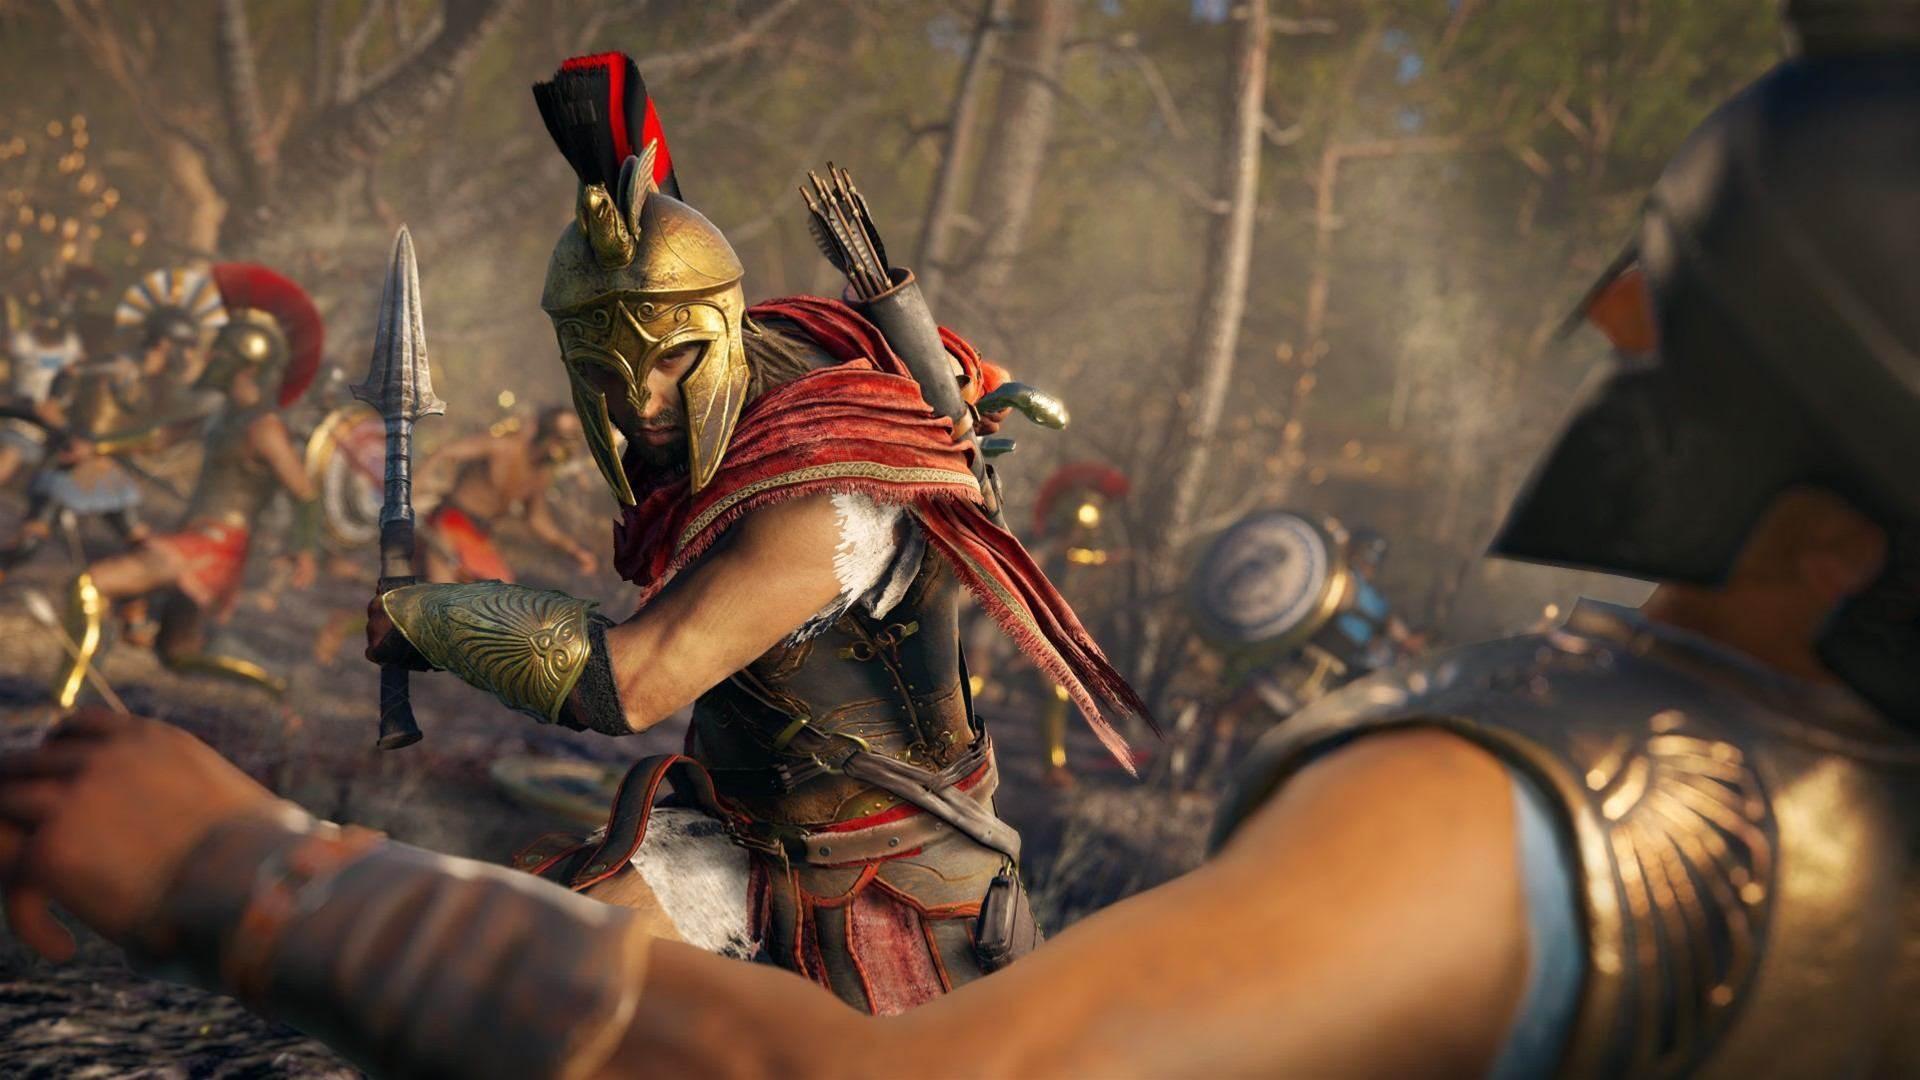 Assassin's Creed Odyssey E3 2018 screens